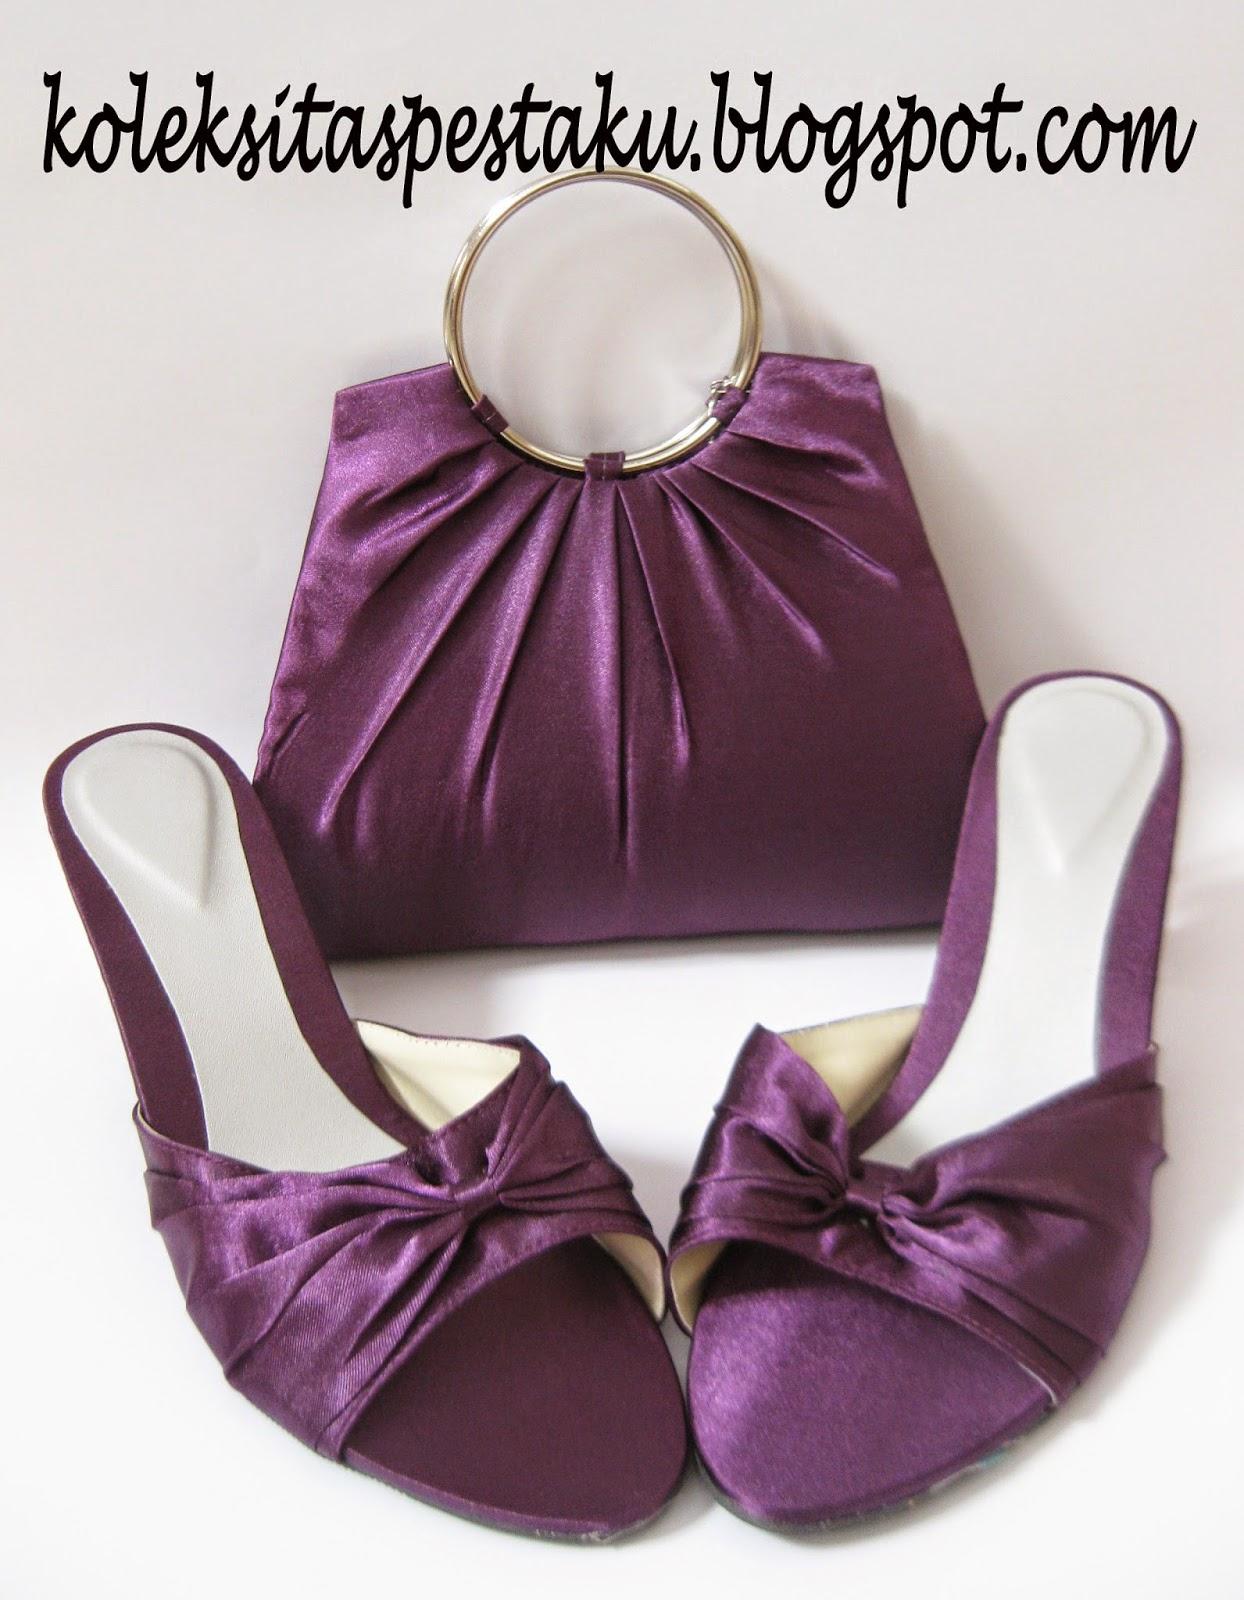 Ungu Cantik Clutch Bag dan Sepatu Pesta Mewah Elegant